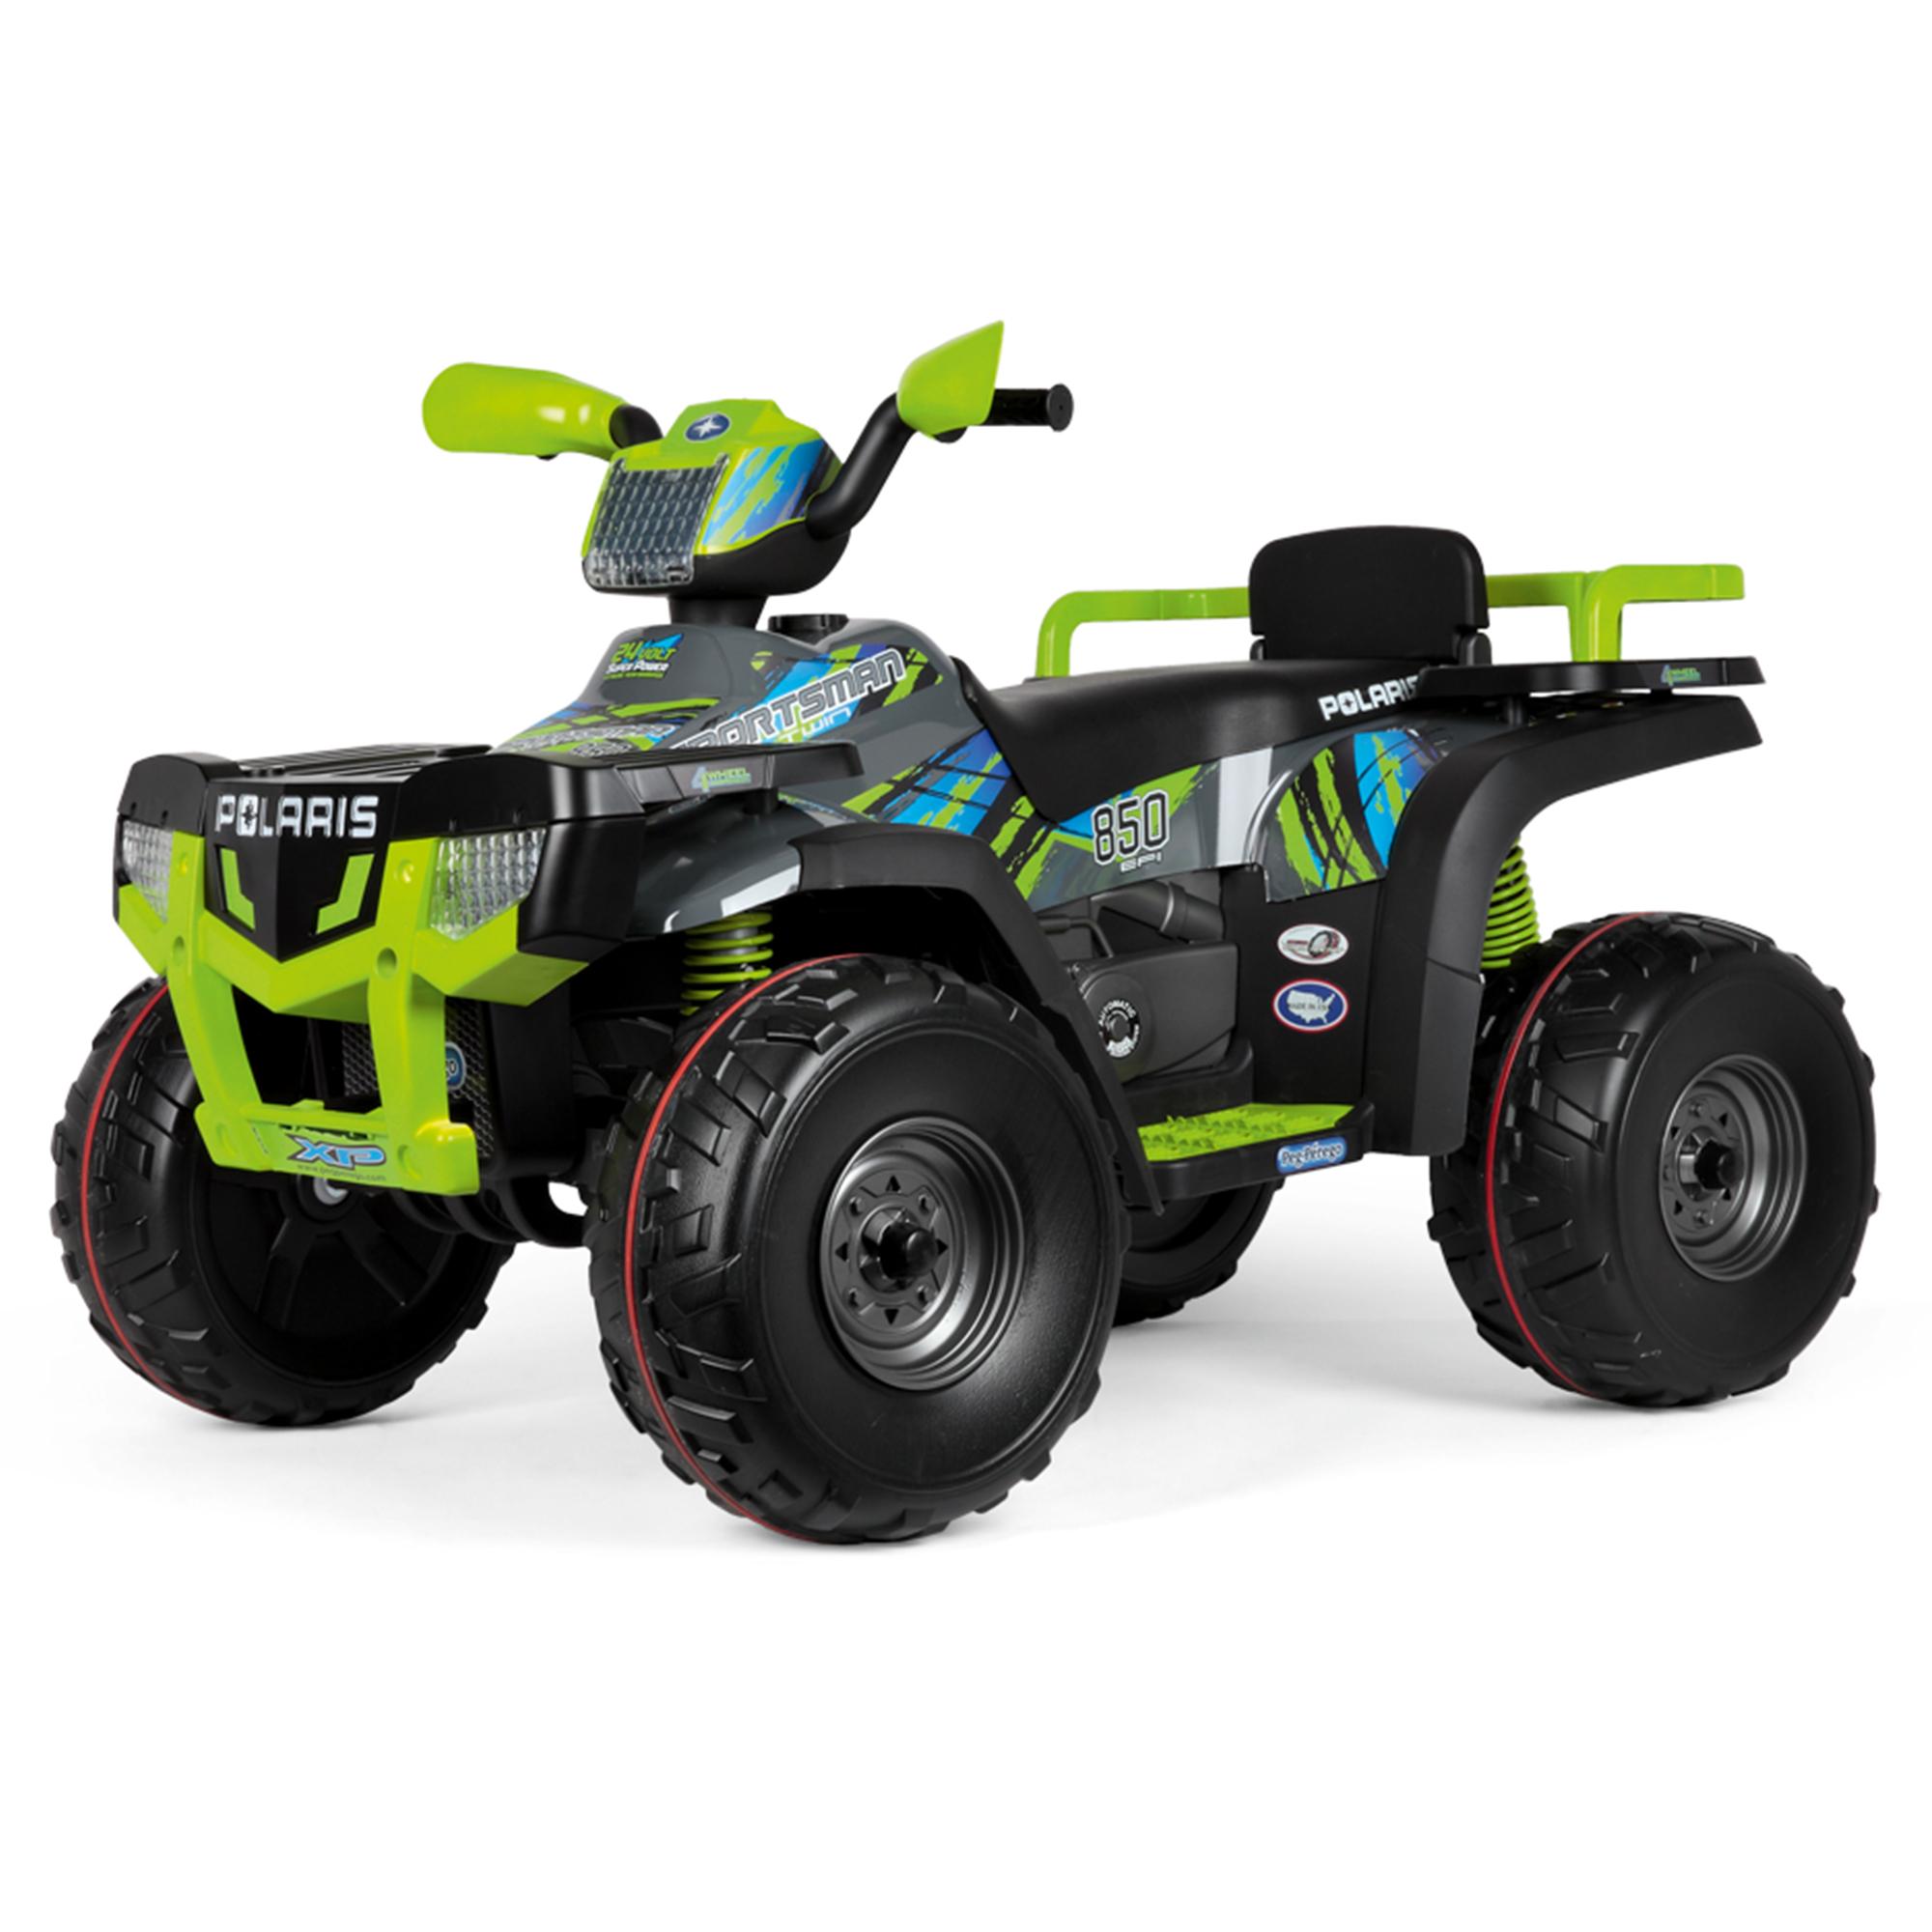 ATV, Peg Peregio, Polaris Sportsman 850 Lime